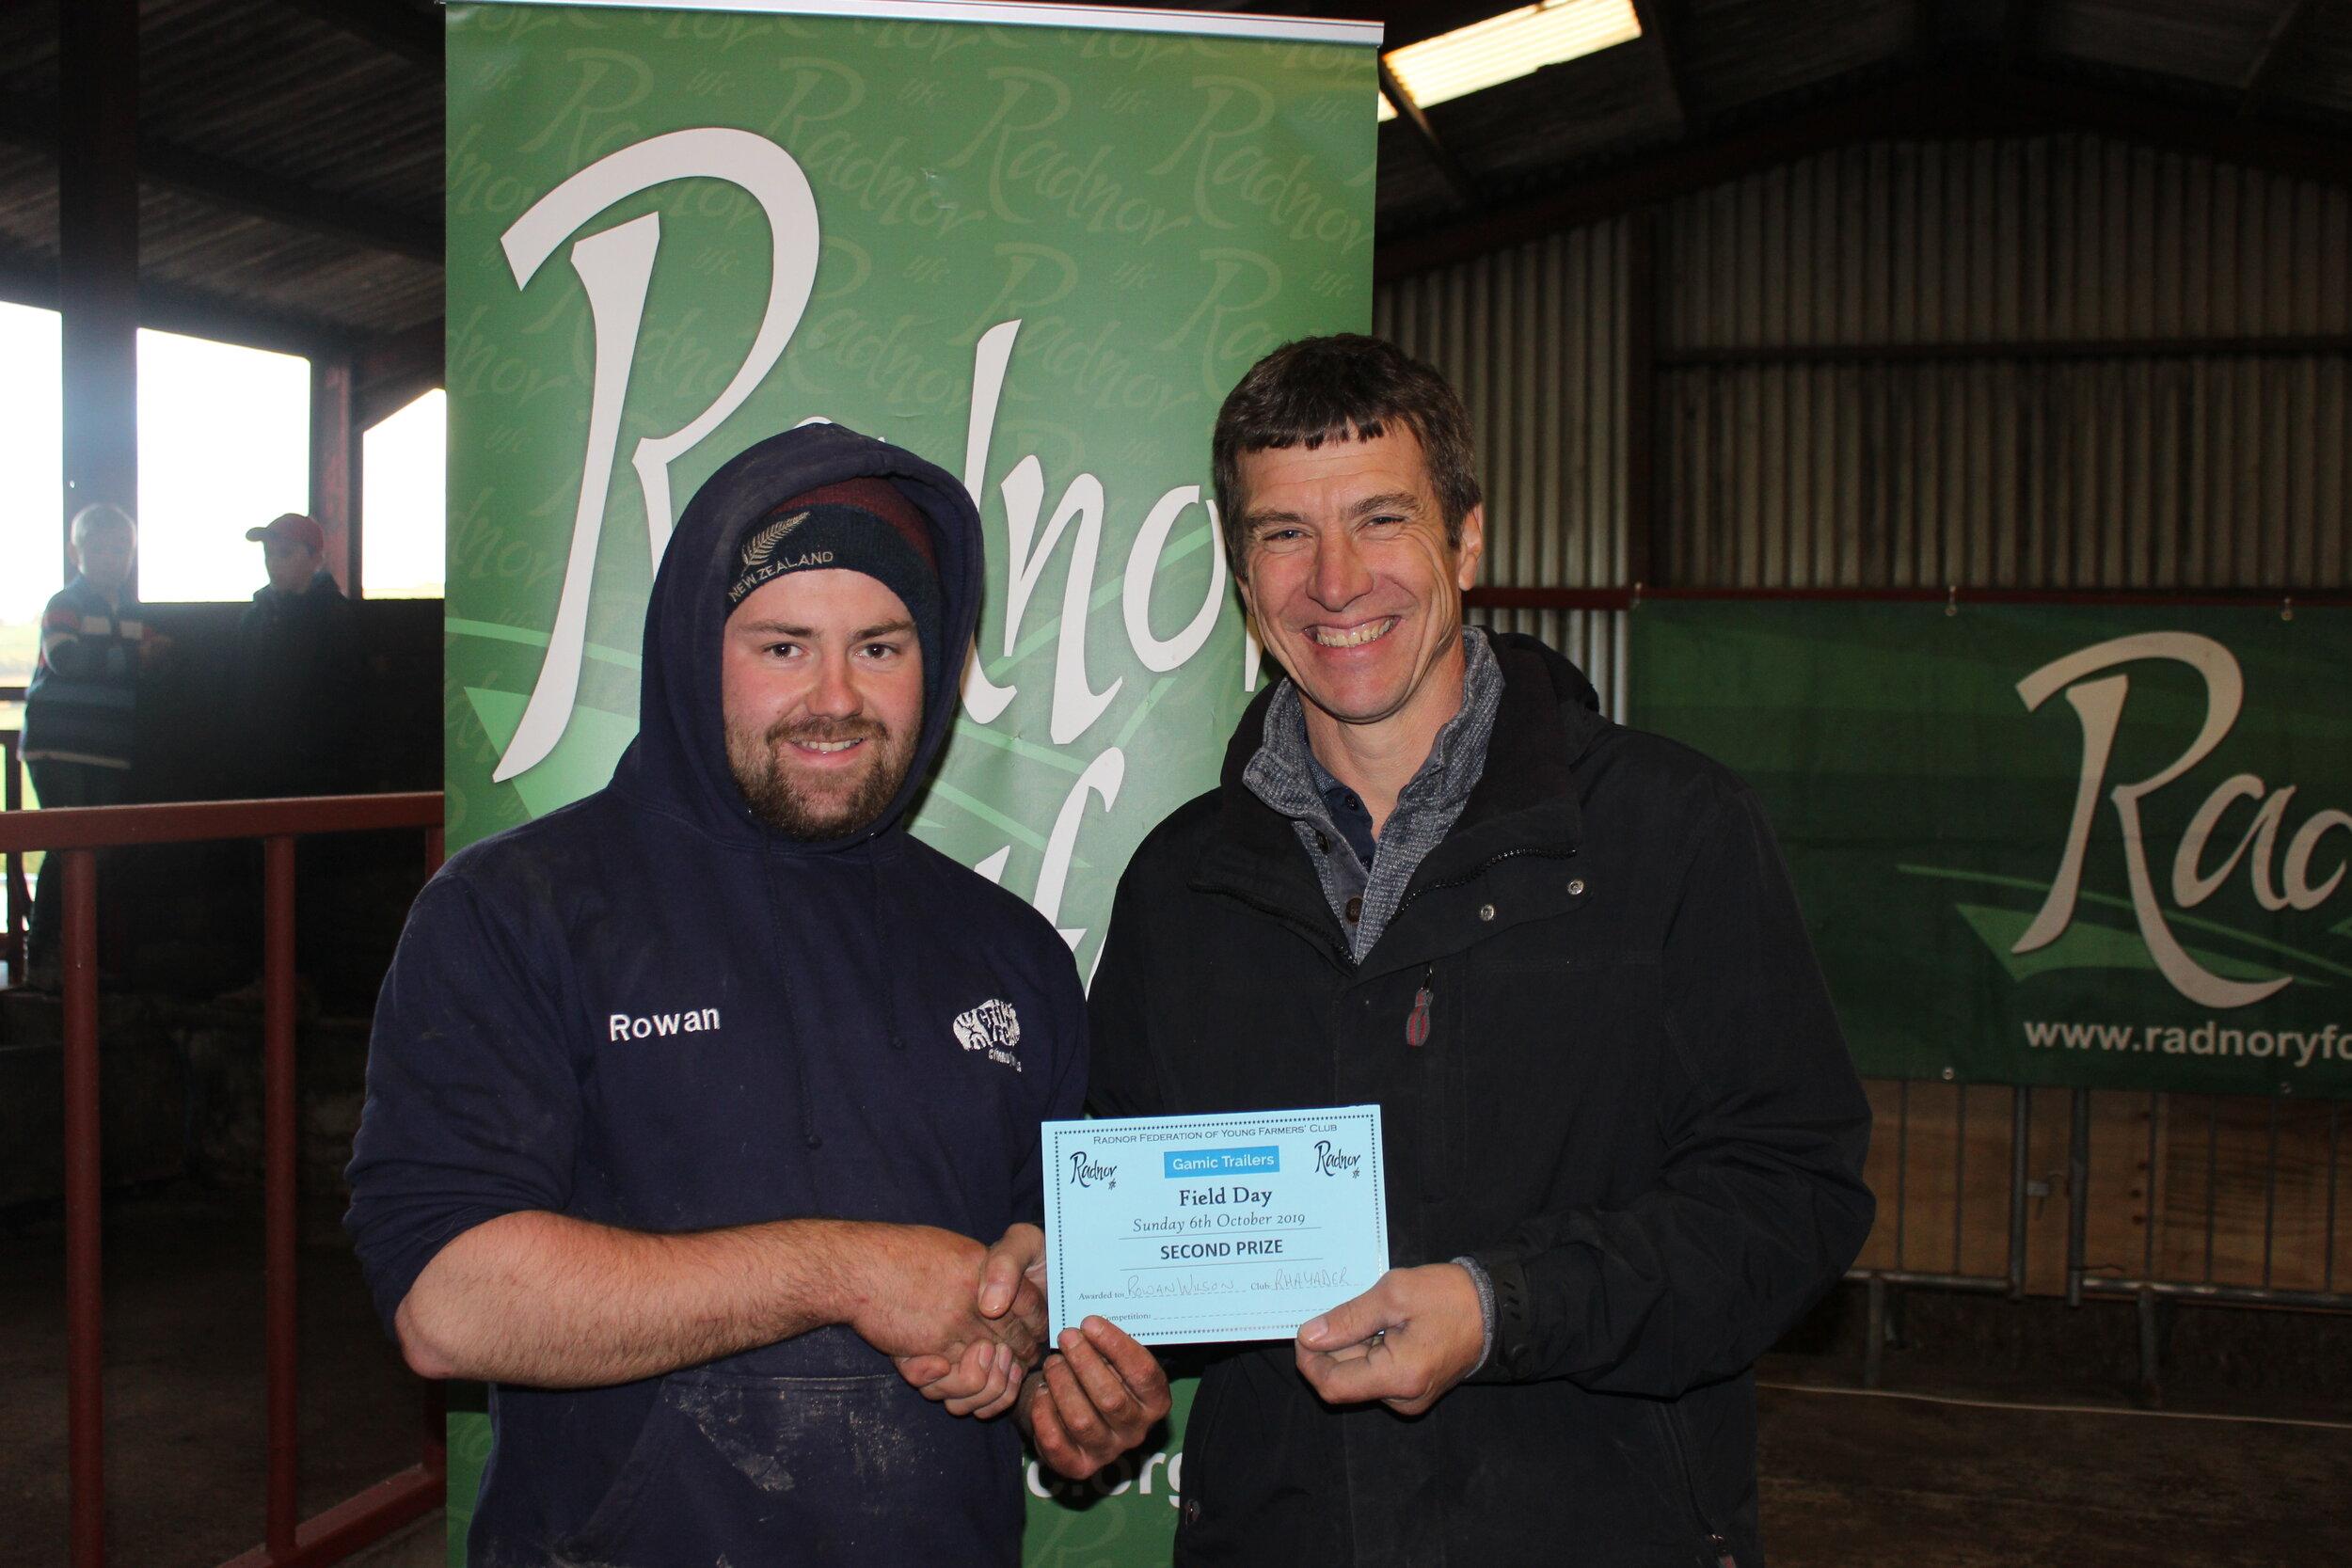 Rowan Wilson, Rhayader YFC - 2nd place in the Lamb Trimming with Mark Watson